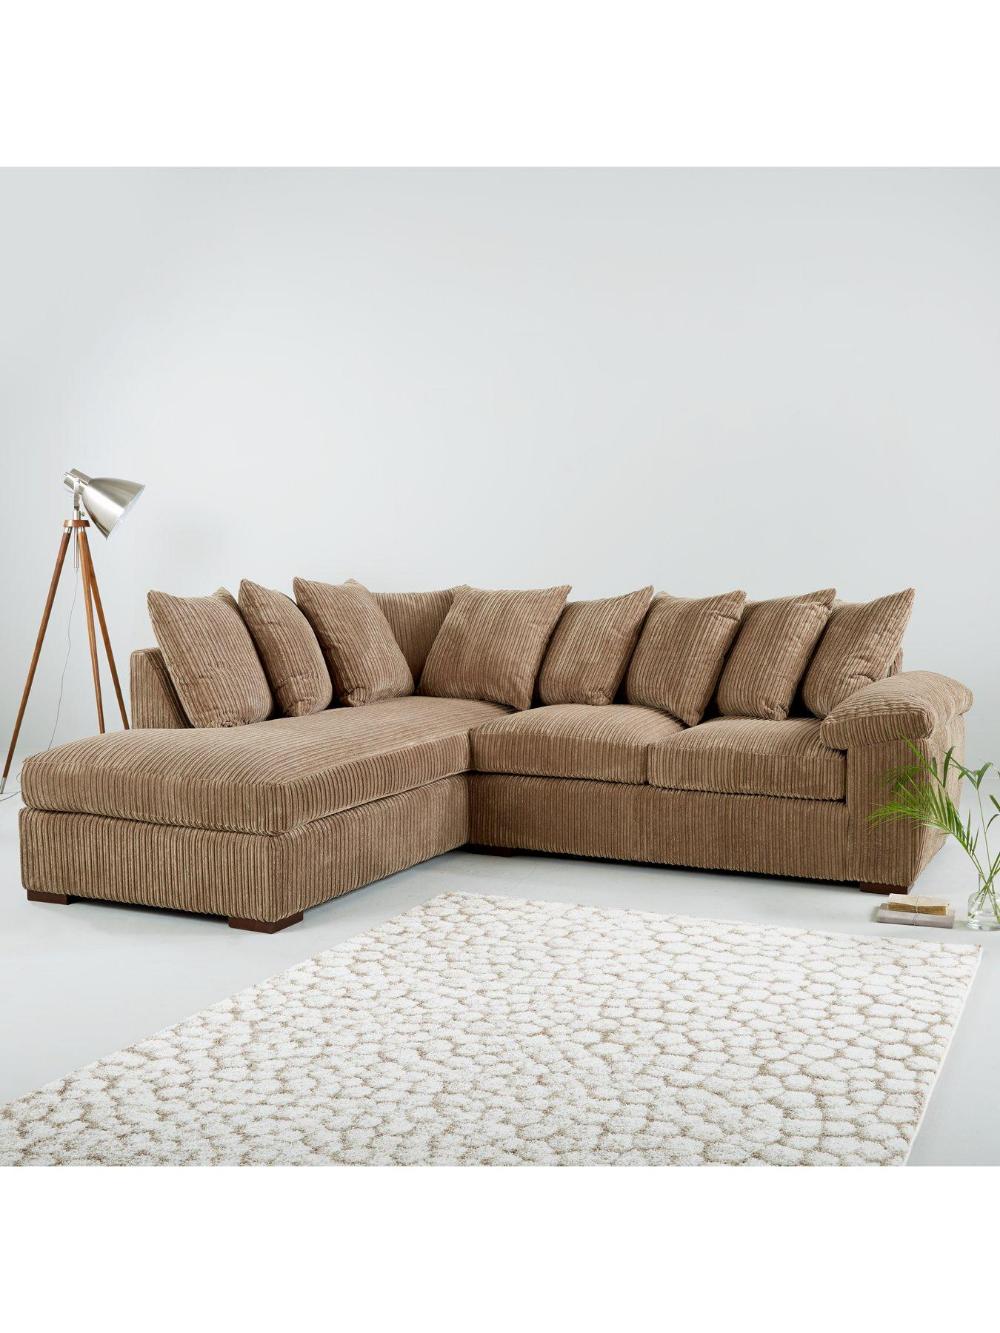 Amalfi Left Hand Scatter Back Fabric Corner Chaise Sofa Mocha Chaise Sofa Sofa Cushion Filling